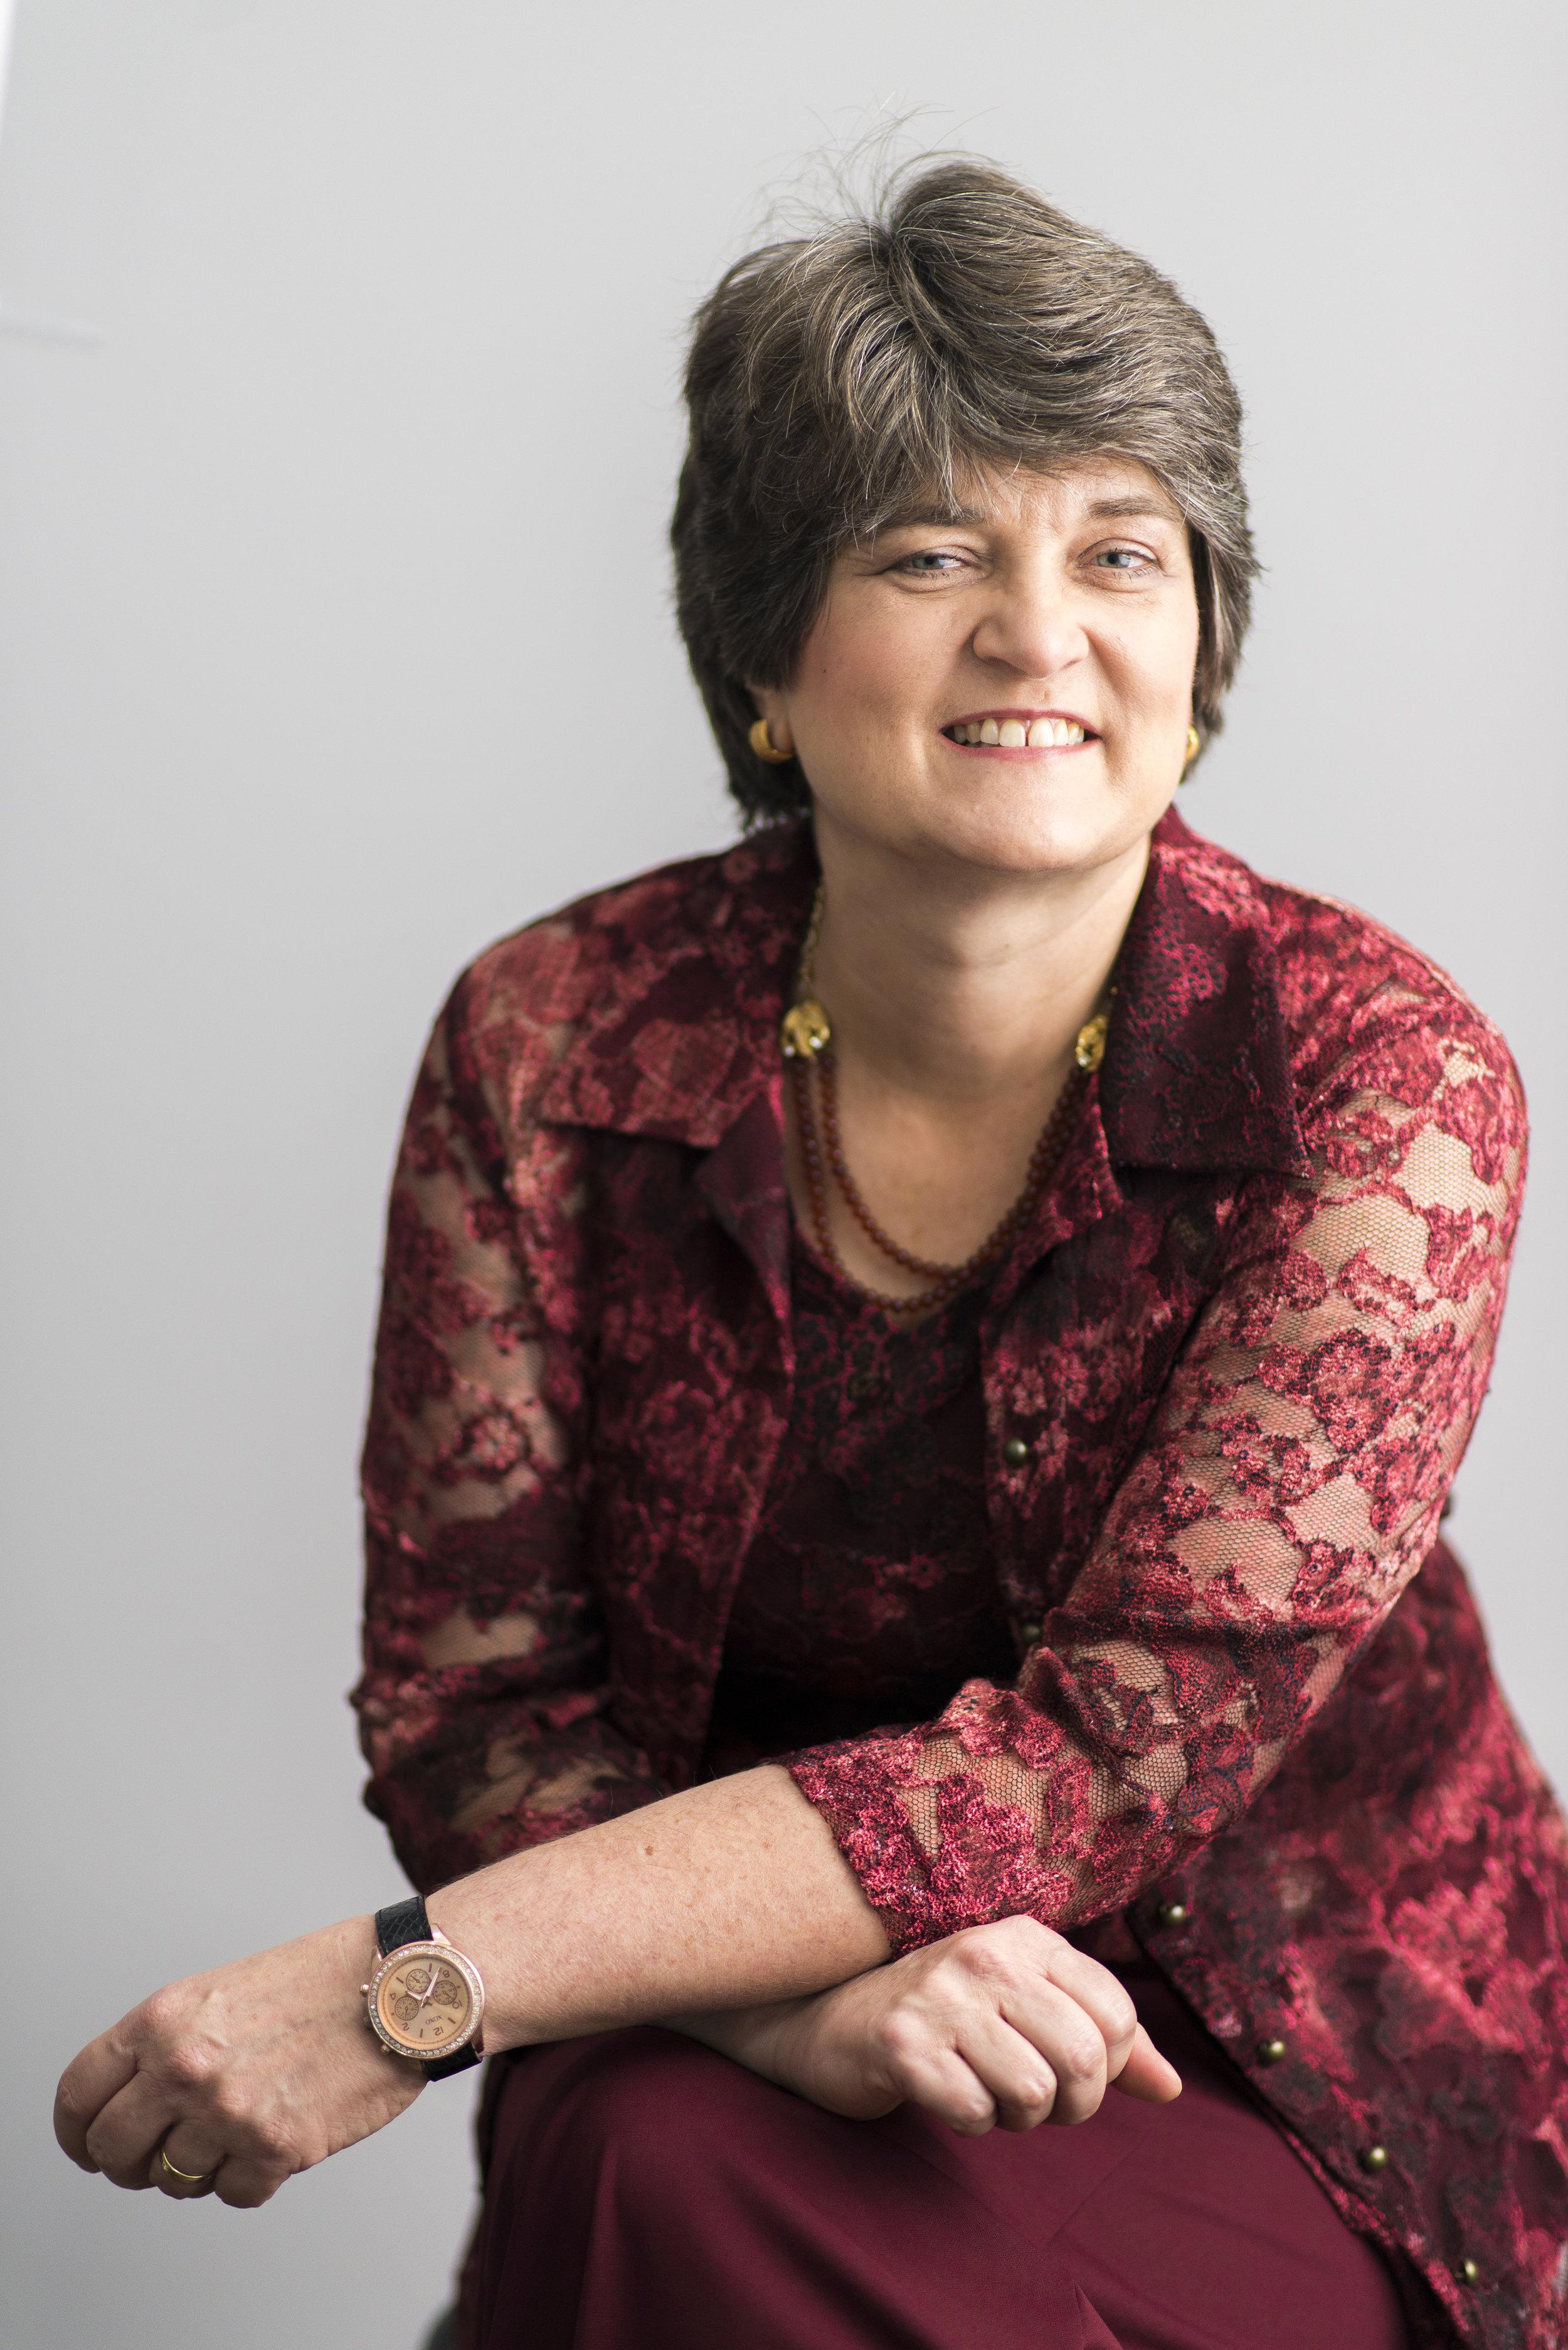 Regina ChaCha - International Executive Director & Co-founder